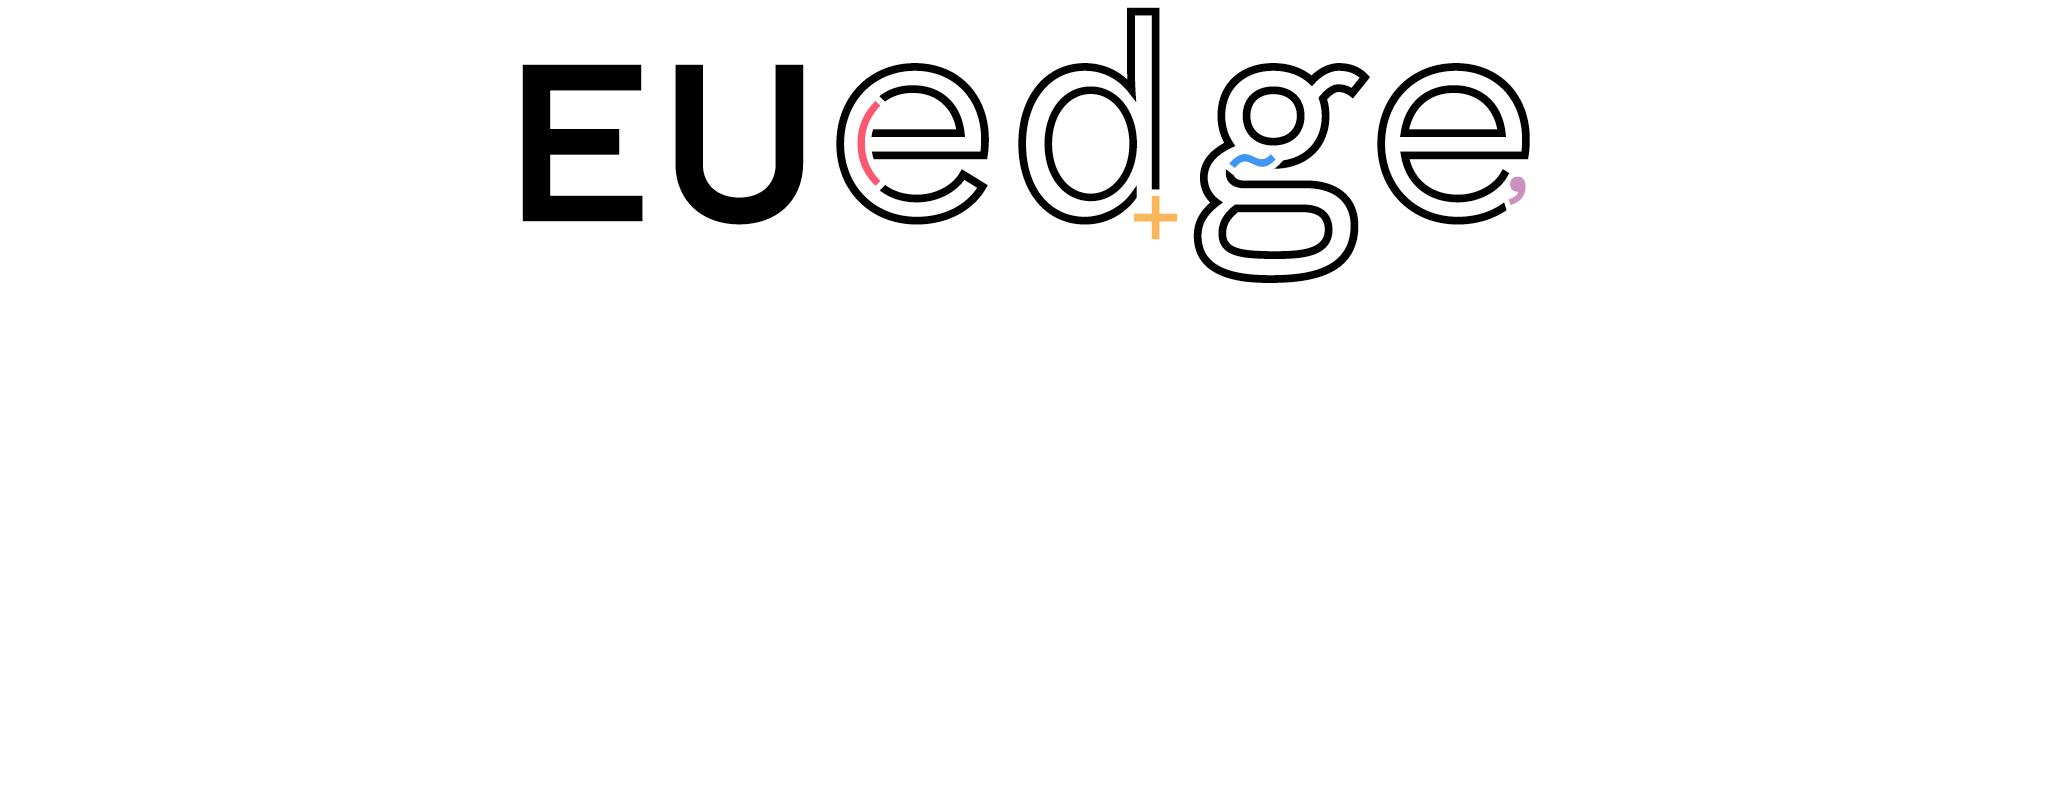 EUedge-LOGO